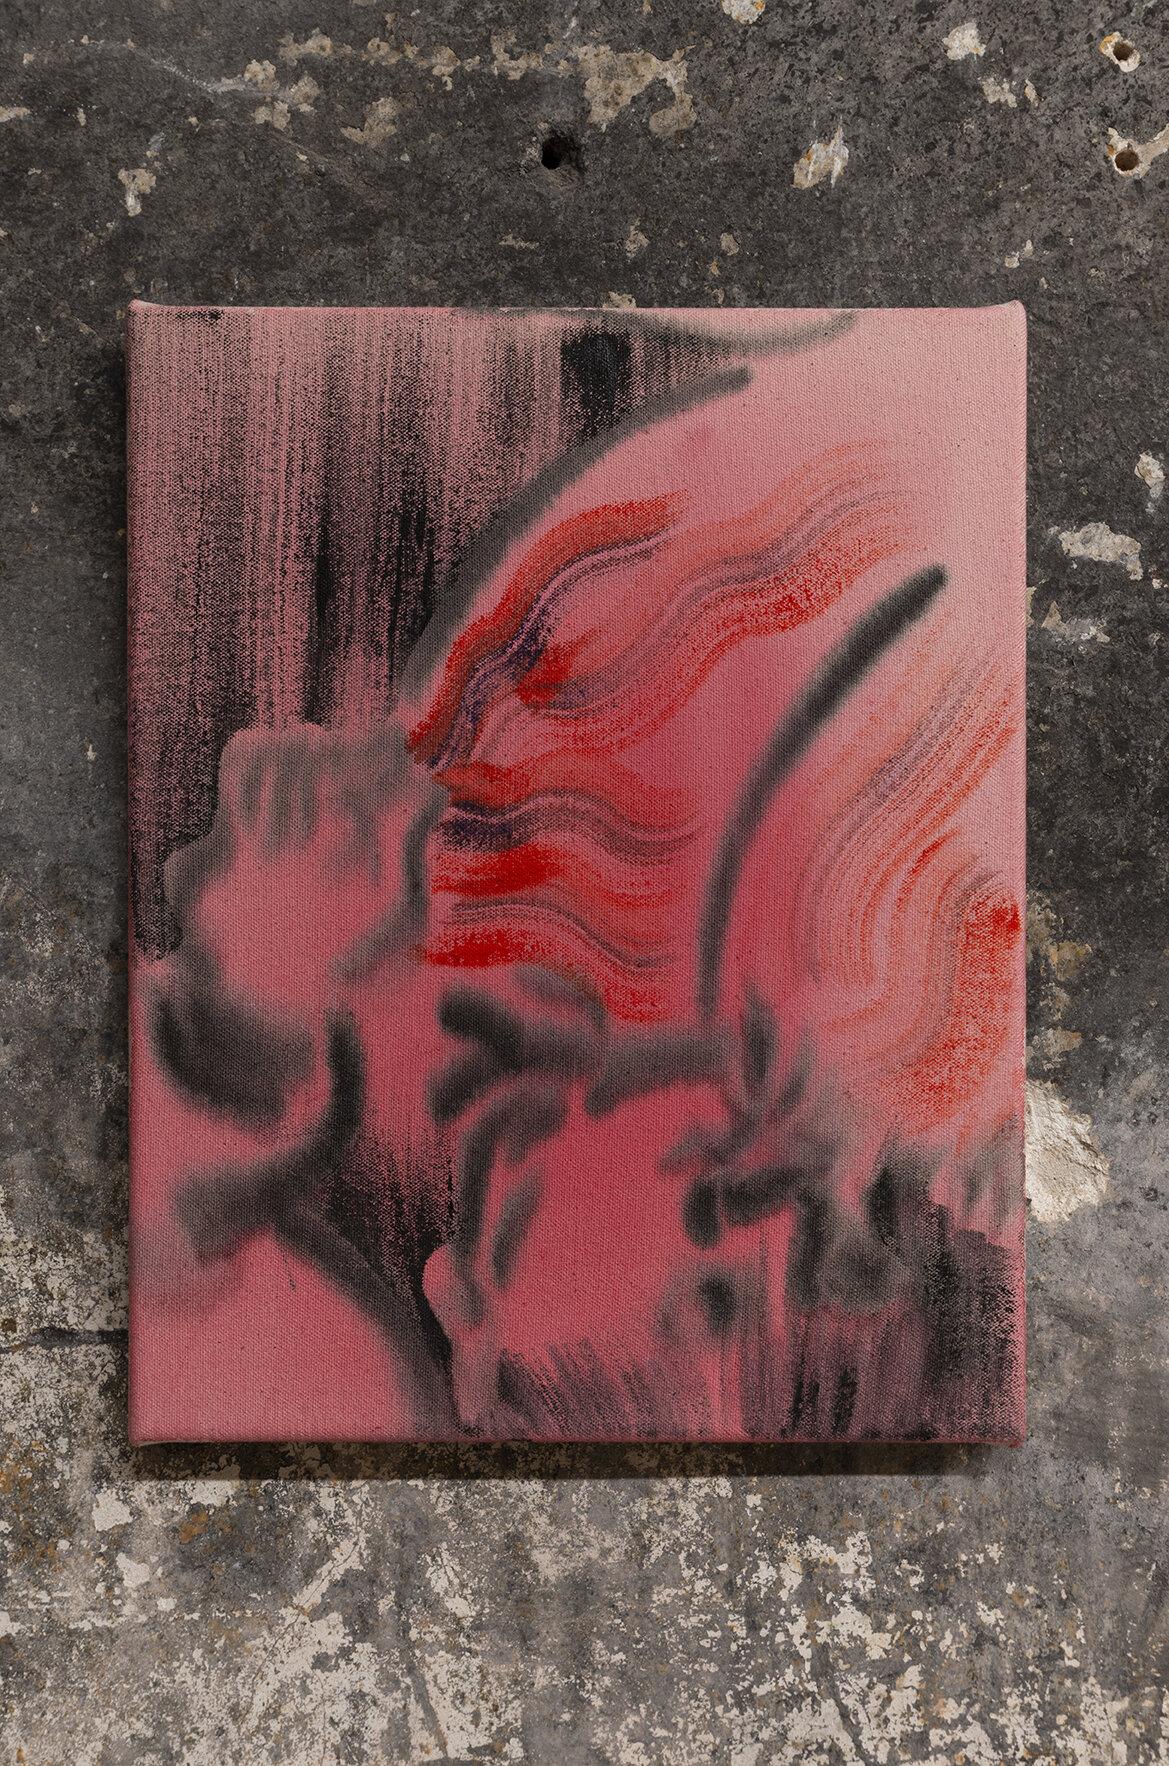 Geetha Thurairajah, Born Again, 2019 Fabric dye and acrylic on canvas 11 x 14 inches